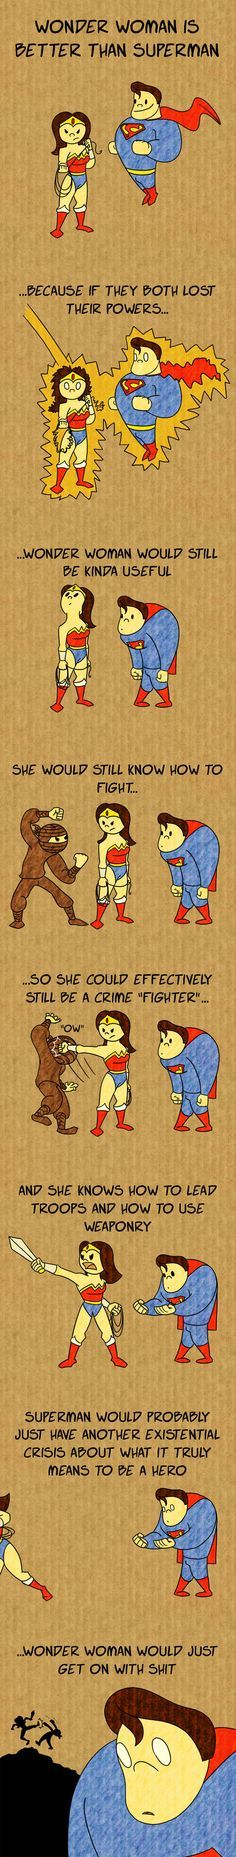 Who is Wonder Woman dating, Superman or Batman? | Yahoo ...